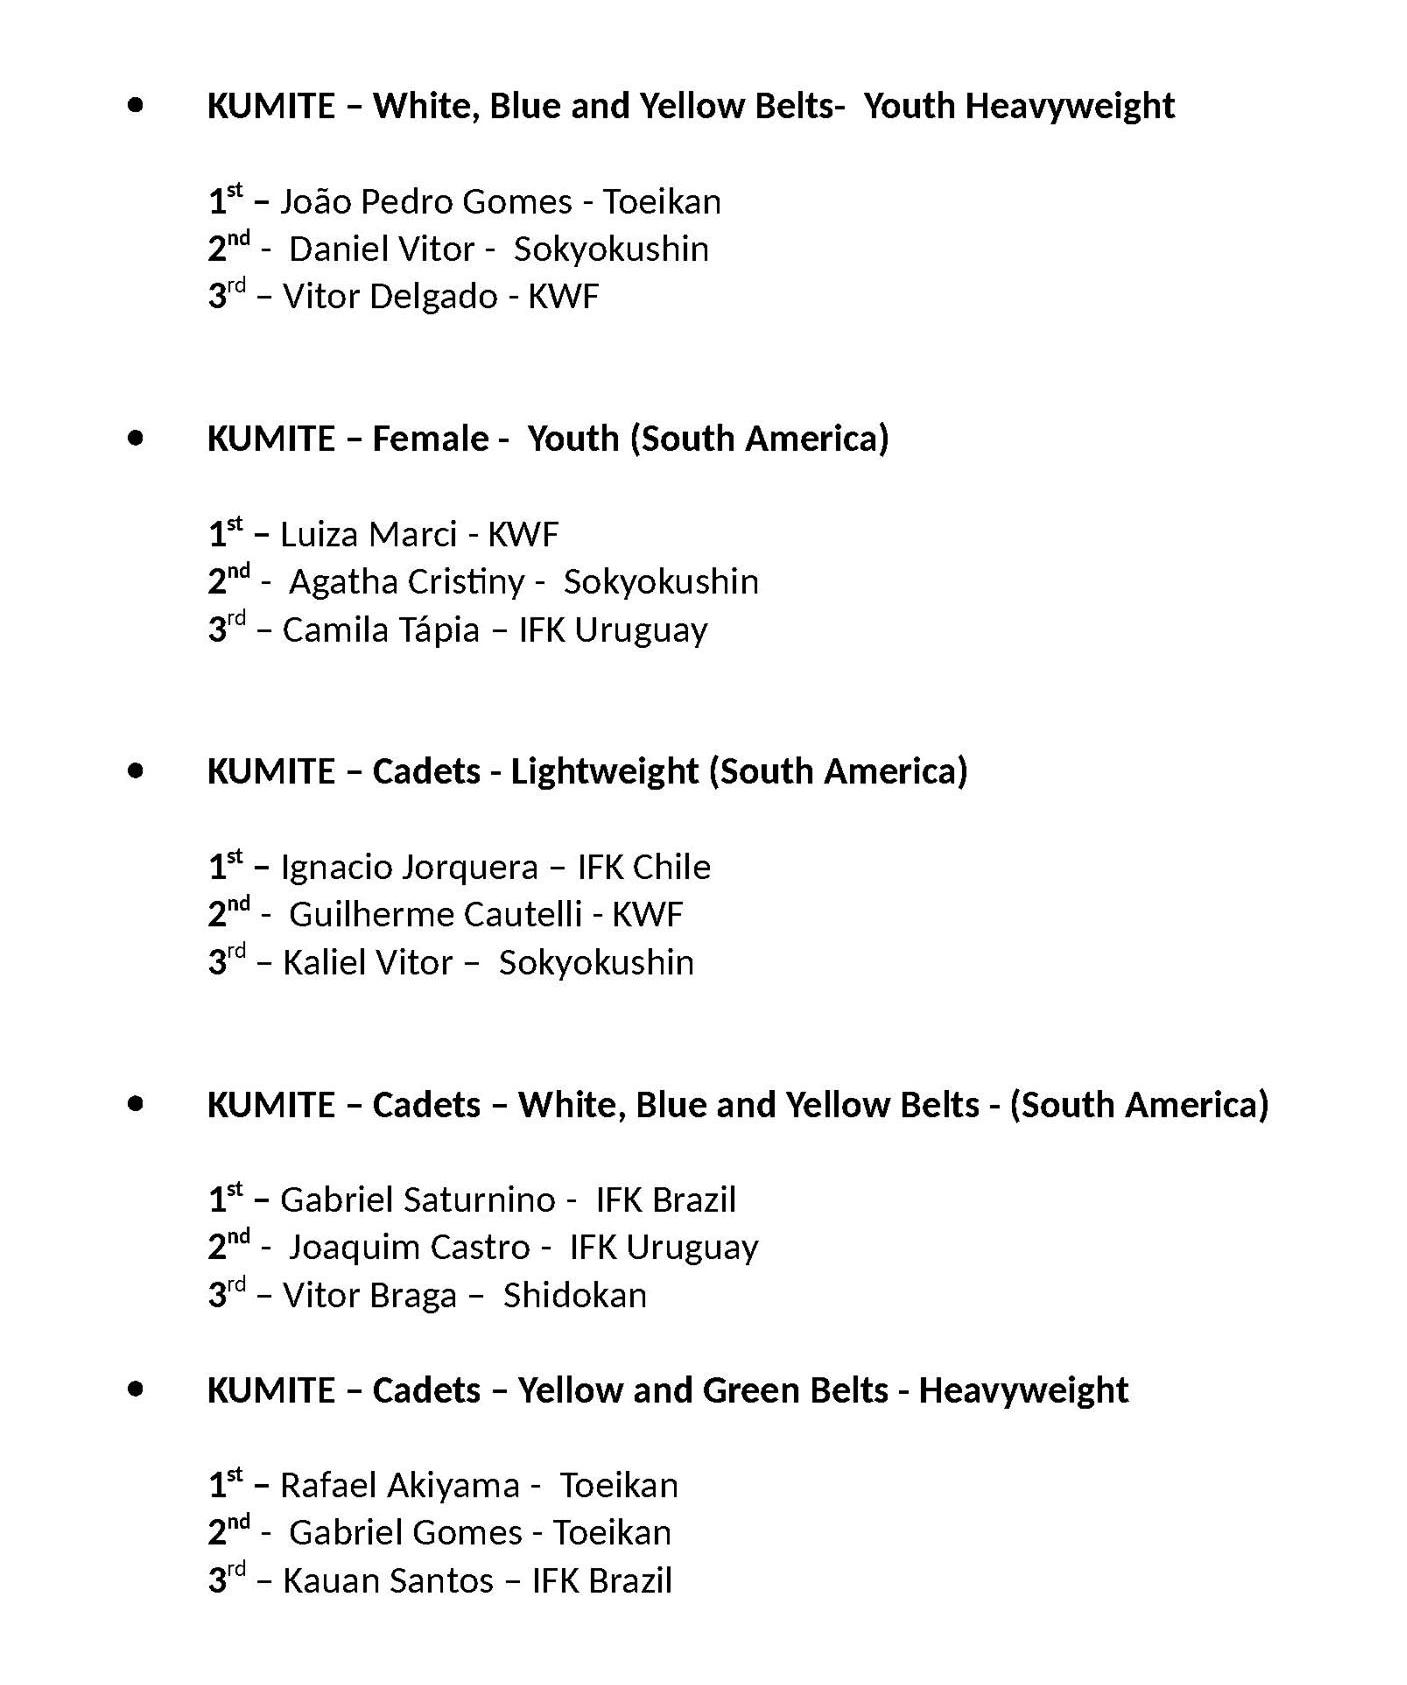 South America Kumite page1 2017.jpg